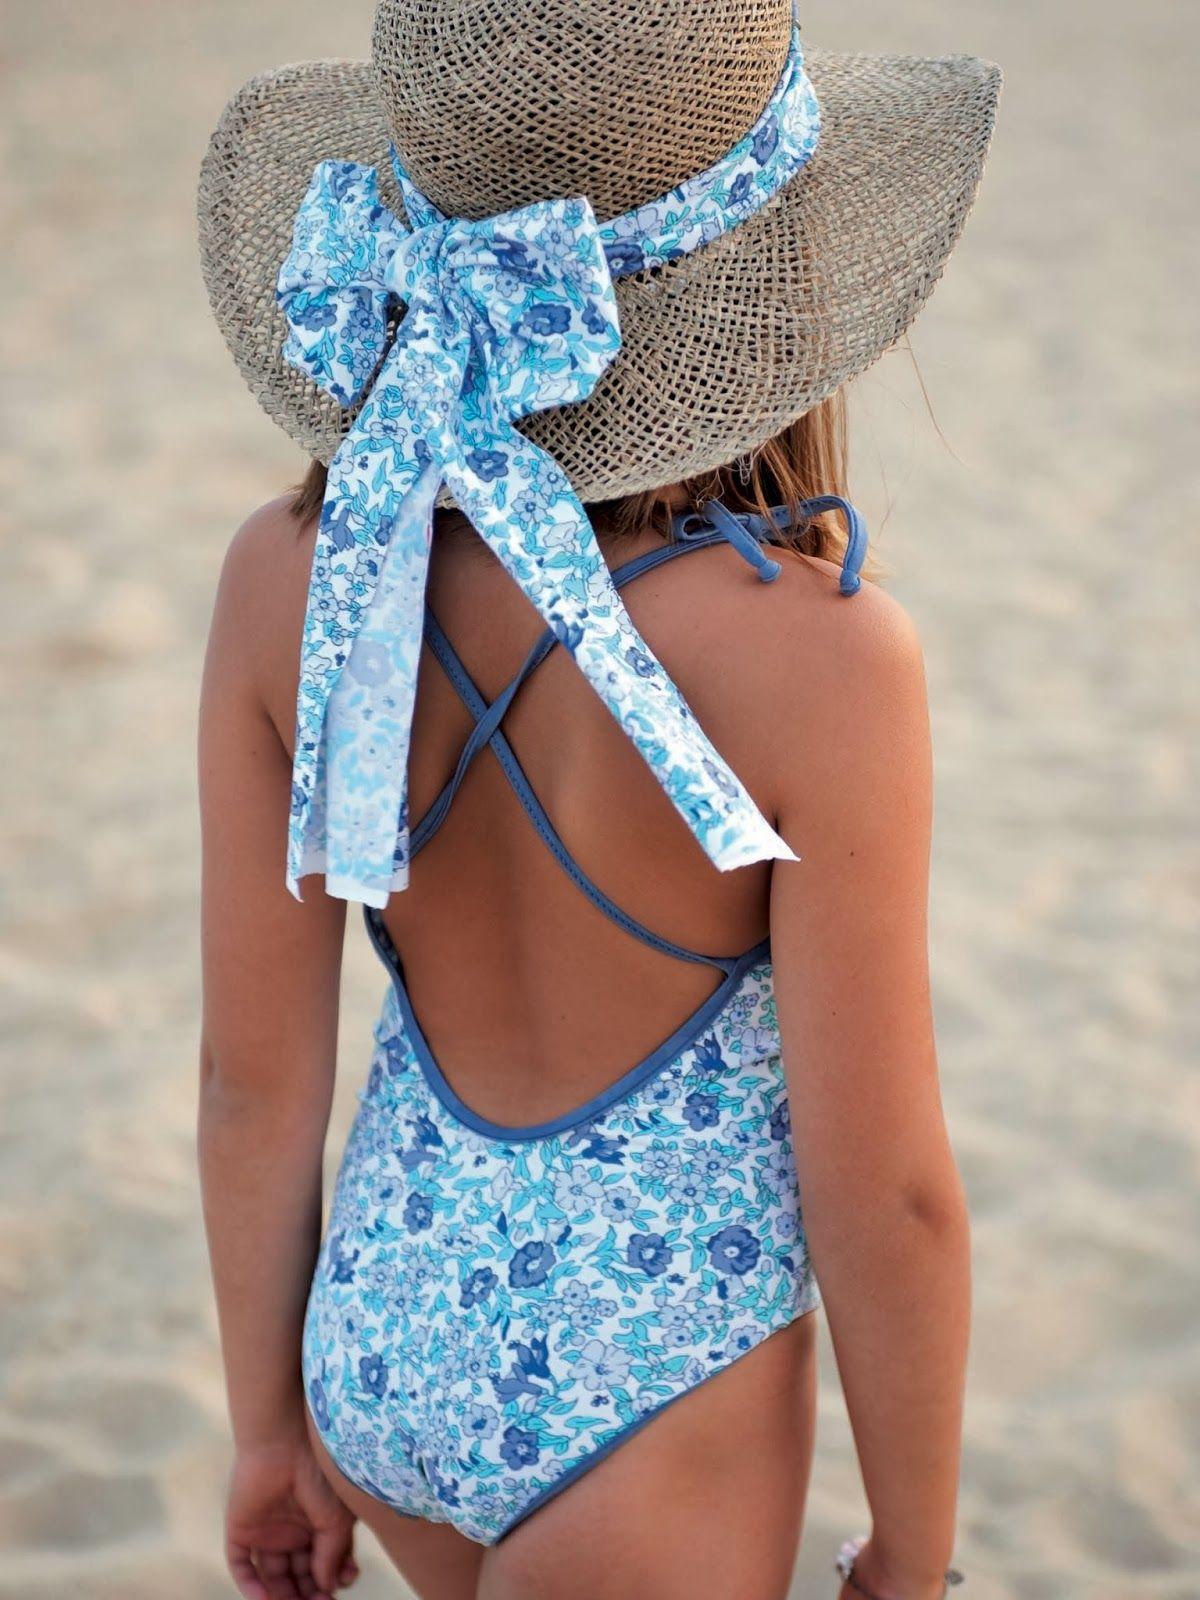 c1191a408d464 Baby Swimwear, Baby Swimsuit, Summer Swimwear, Beach Kids, Summer Kids,  Summer